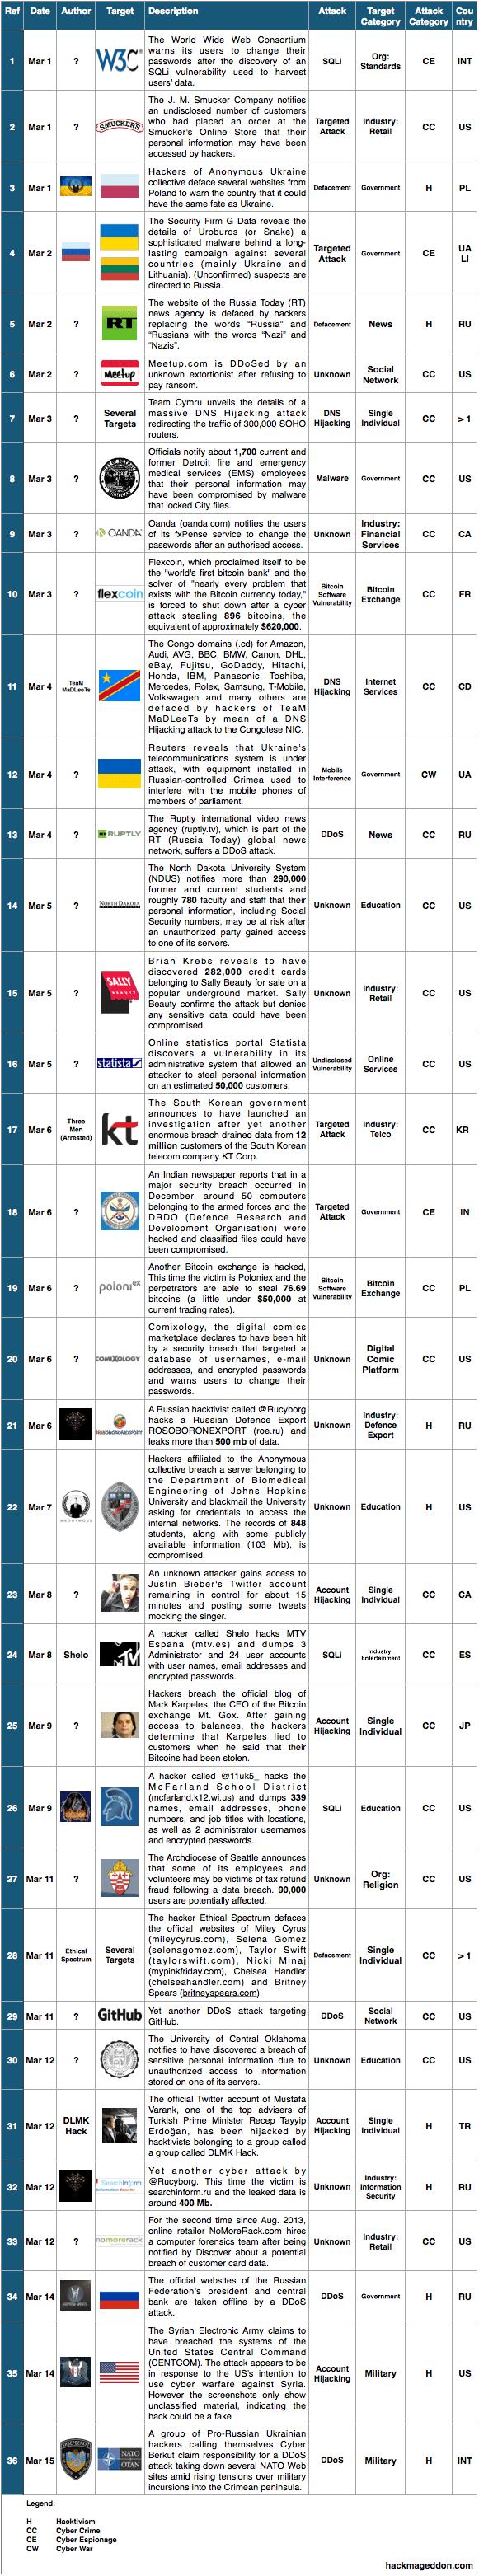 1-15 Mar 2014 Cyber Attacks Timeline